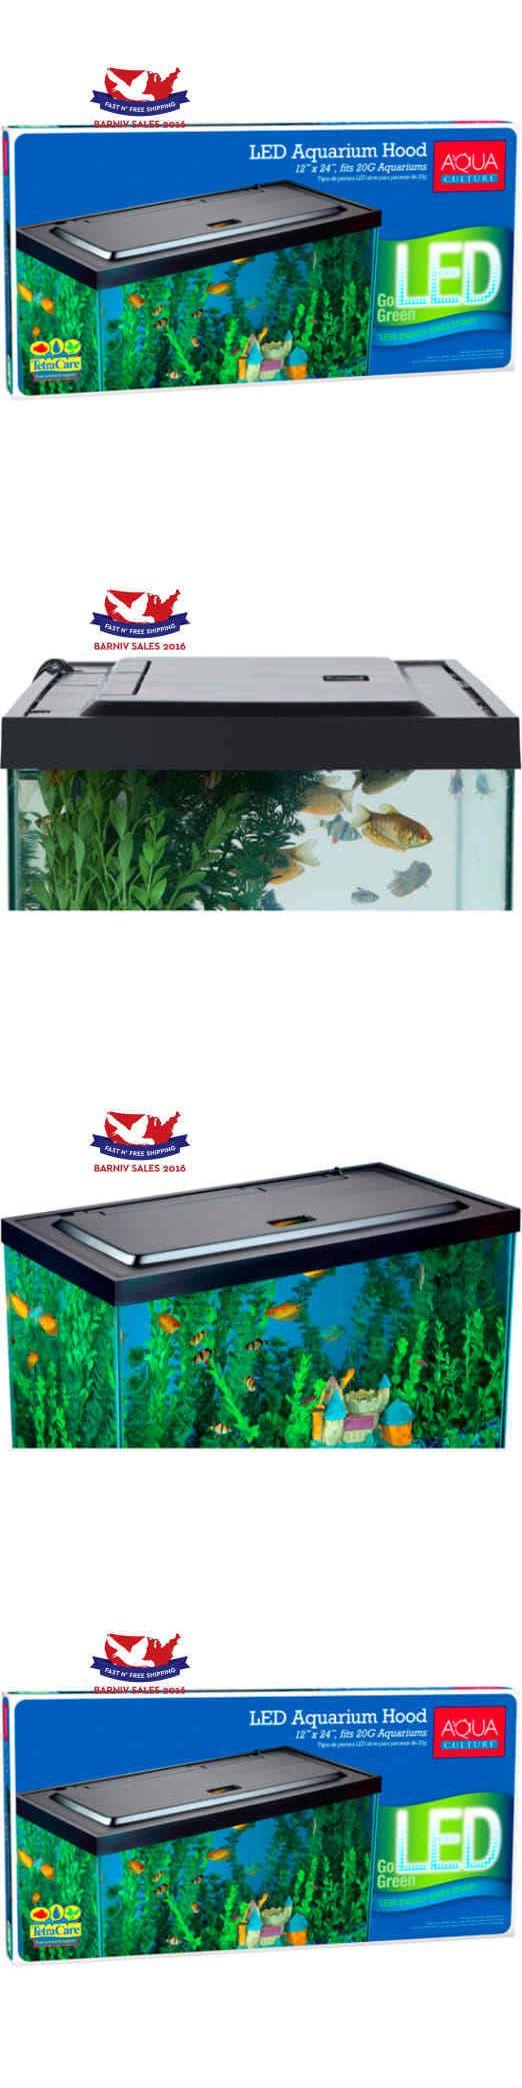 Aquariums and Tanks 20755: Genuine Aqua Culture Led Aquarium Hood For 20/55 Gallon Aquariums BUY IT NOW ONLY: $55.52